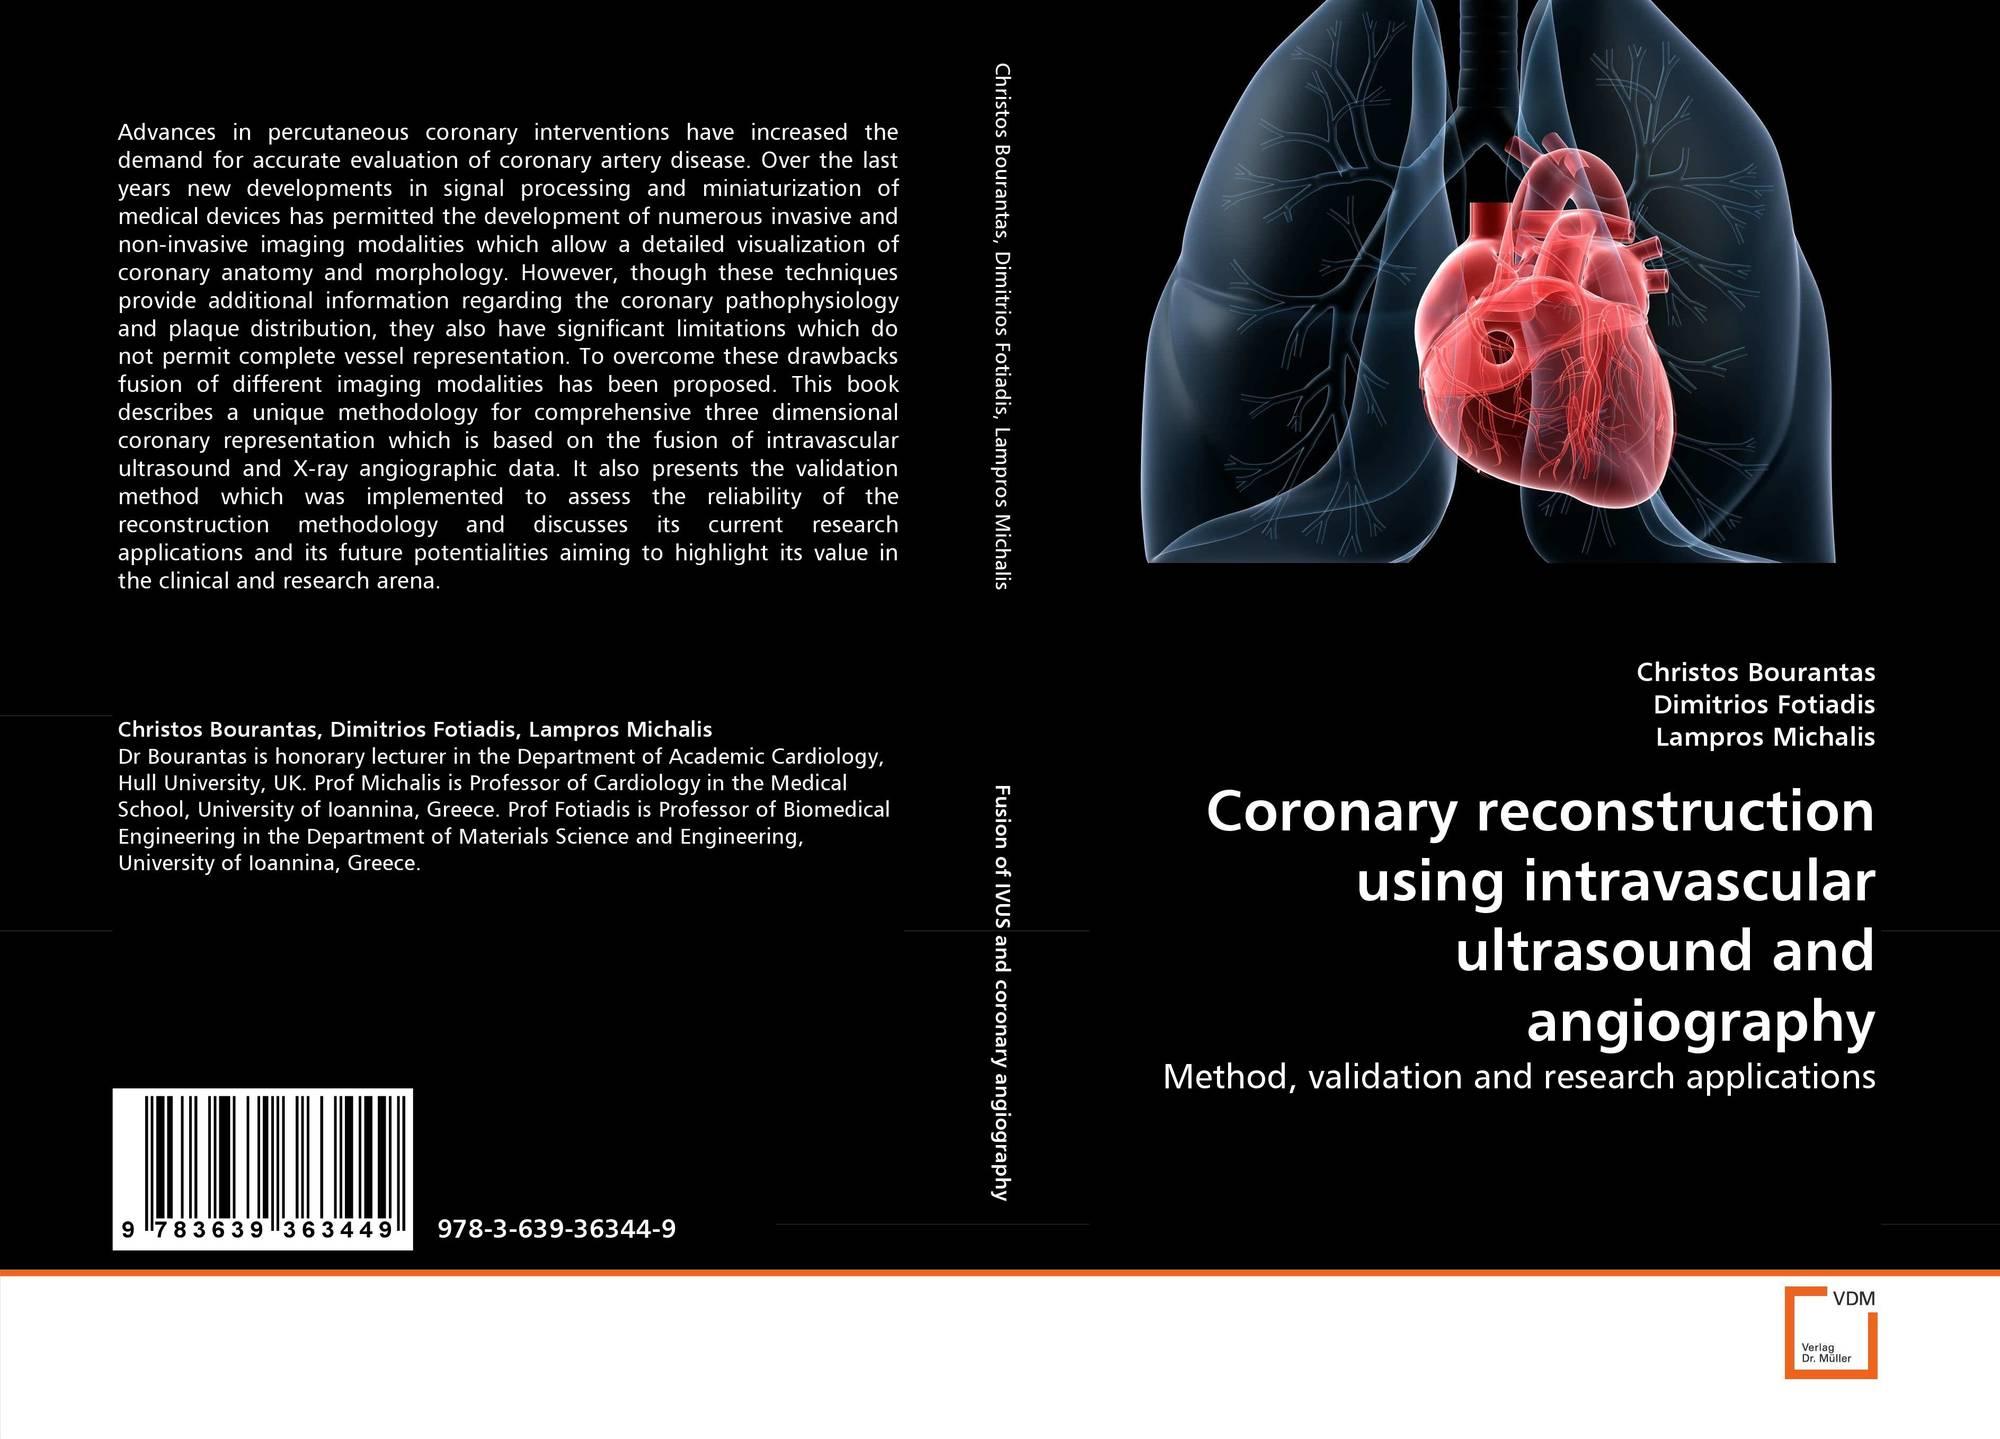 Coronary reconstruction using intravascular ultrasound and